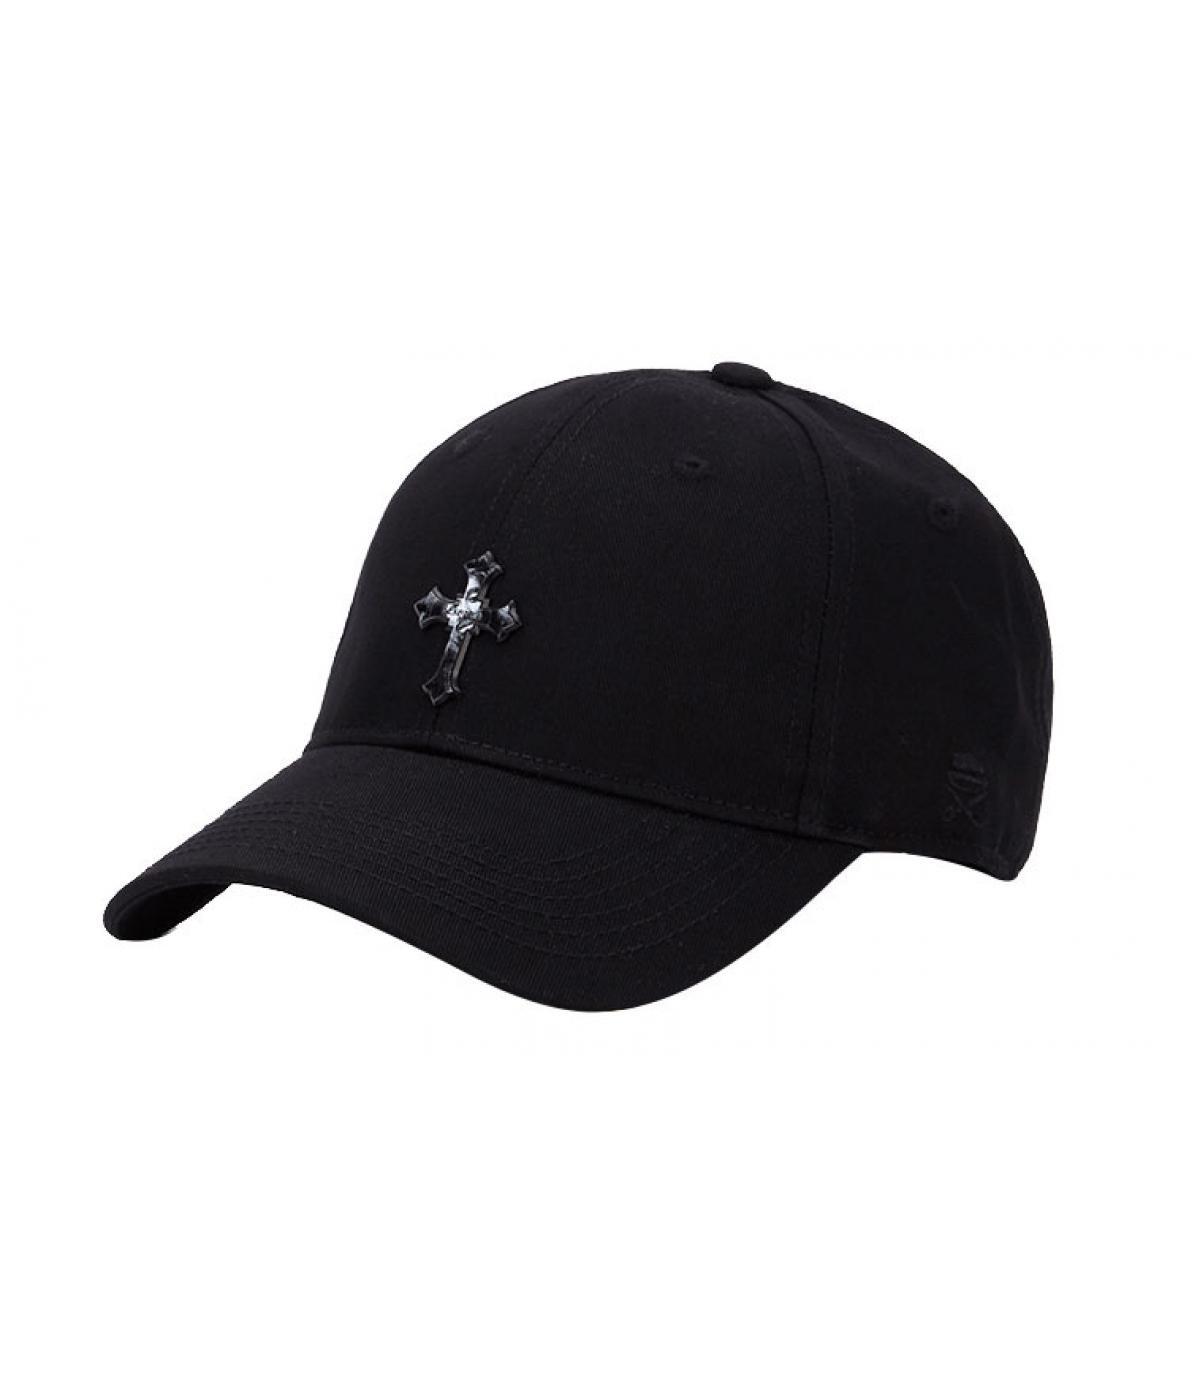 casquette Marley noire